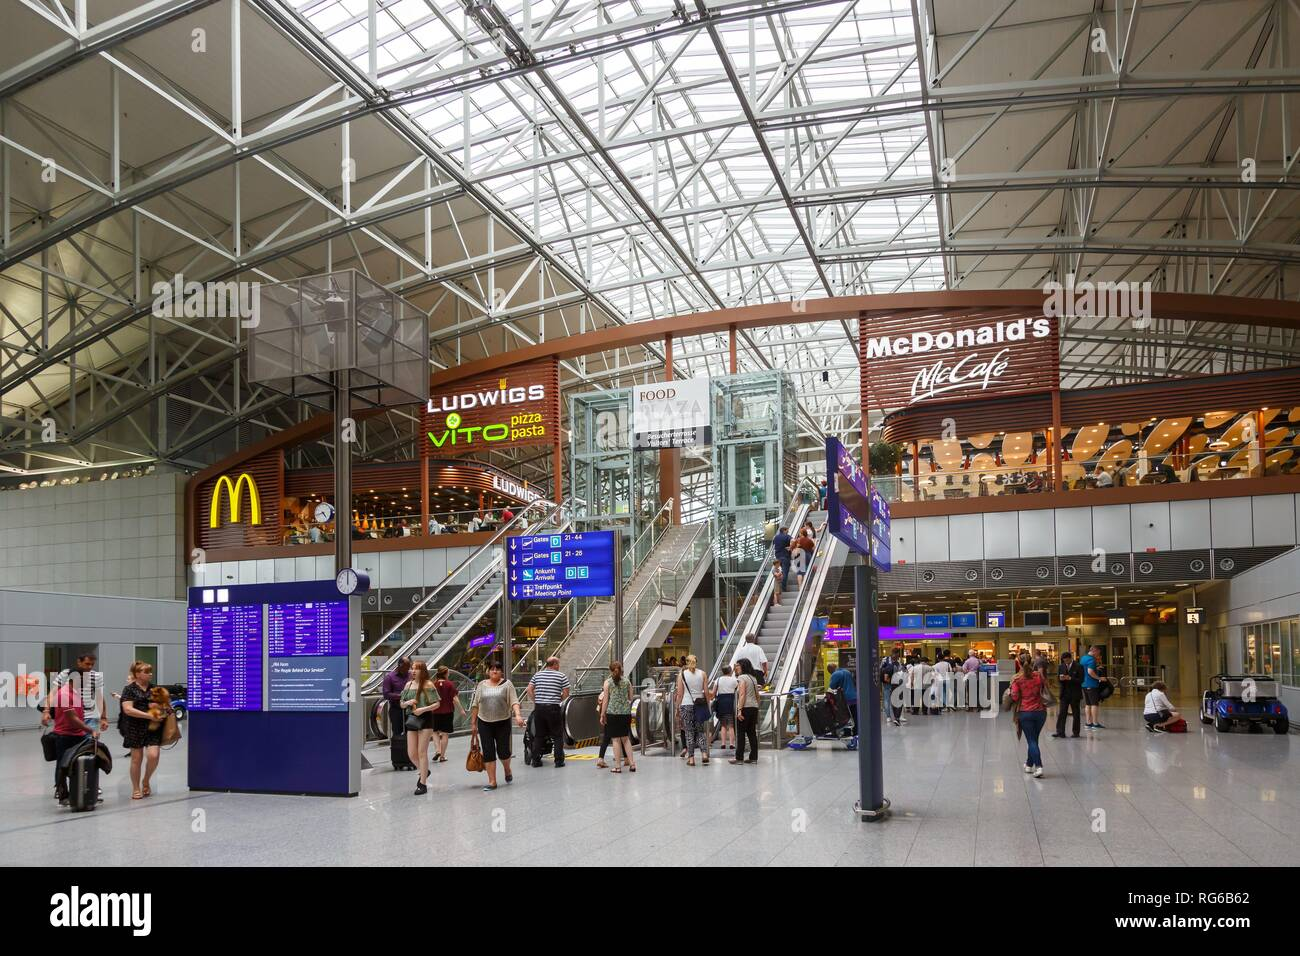 mcdonalds frankfurt airport